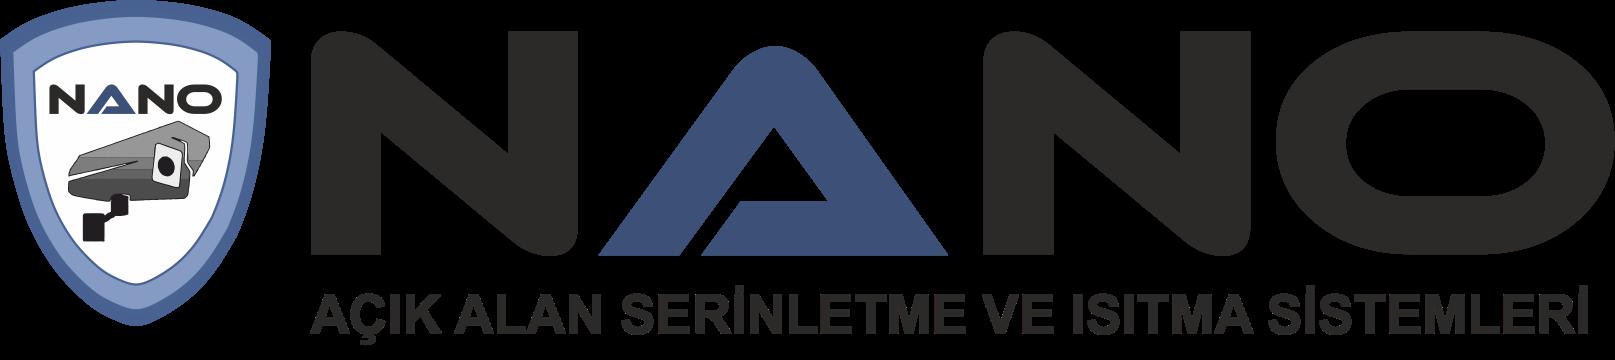 https://www.nanoserinletme.com/img/footer-logo.png